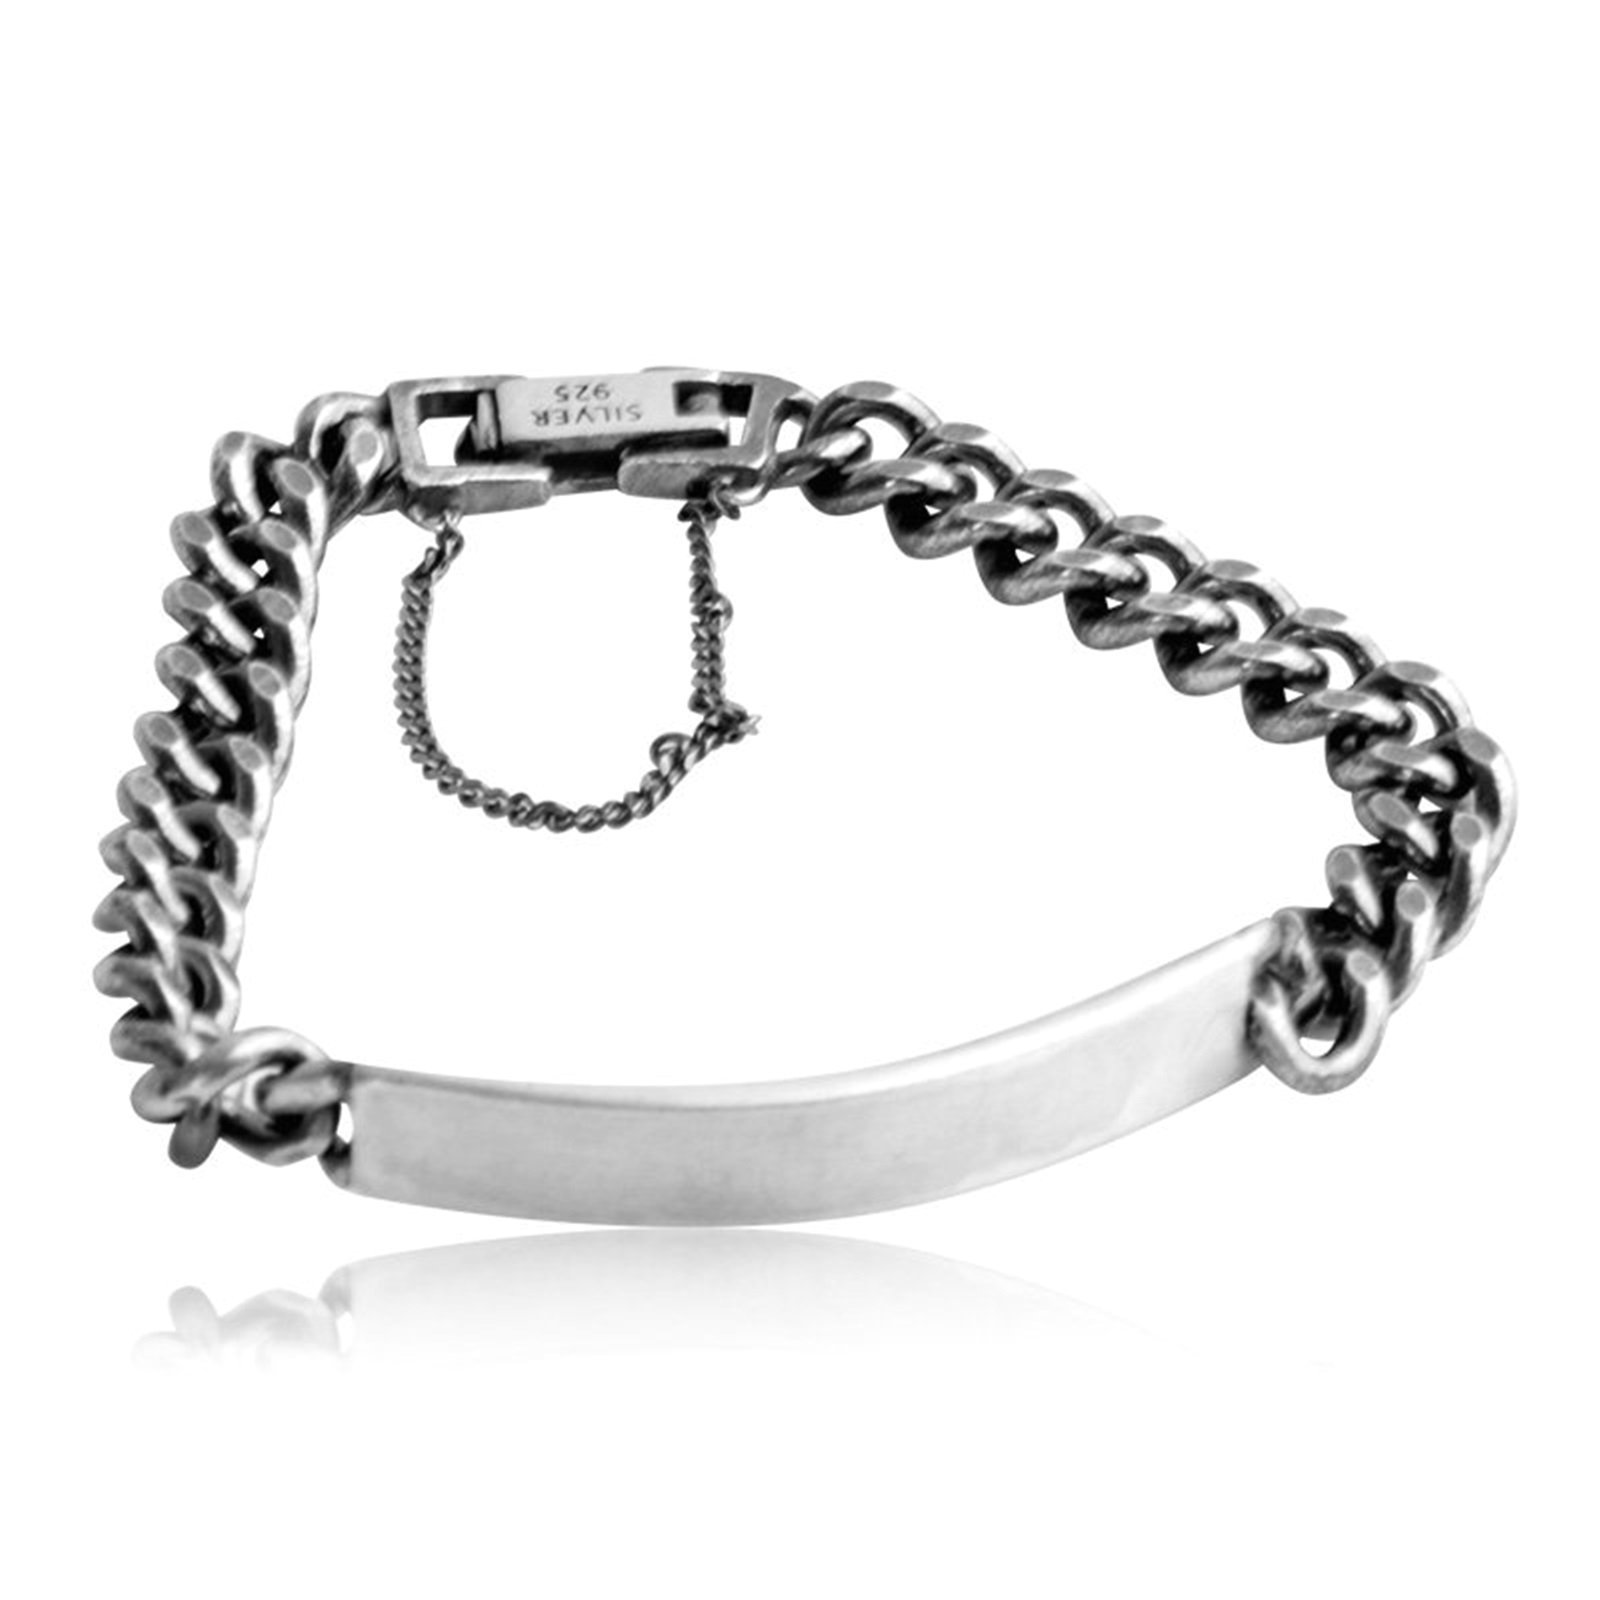 Daesar 925 Silver Bracelet For Men Curved Chain Shape Bracelet Silver Chain Length:17CM by Daesar